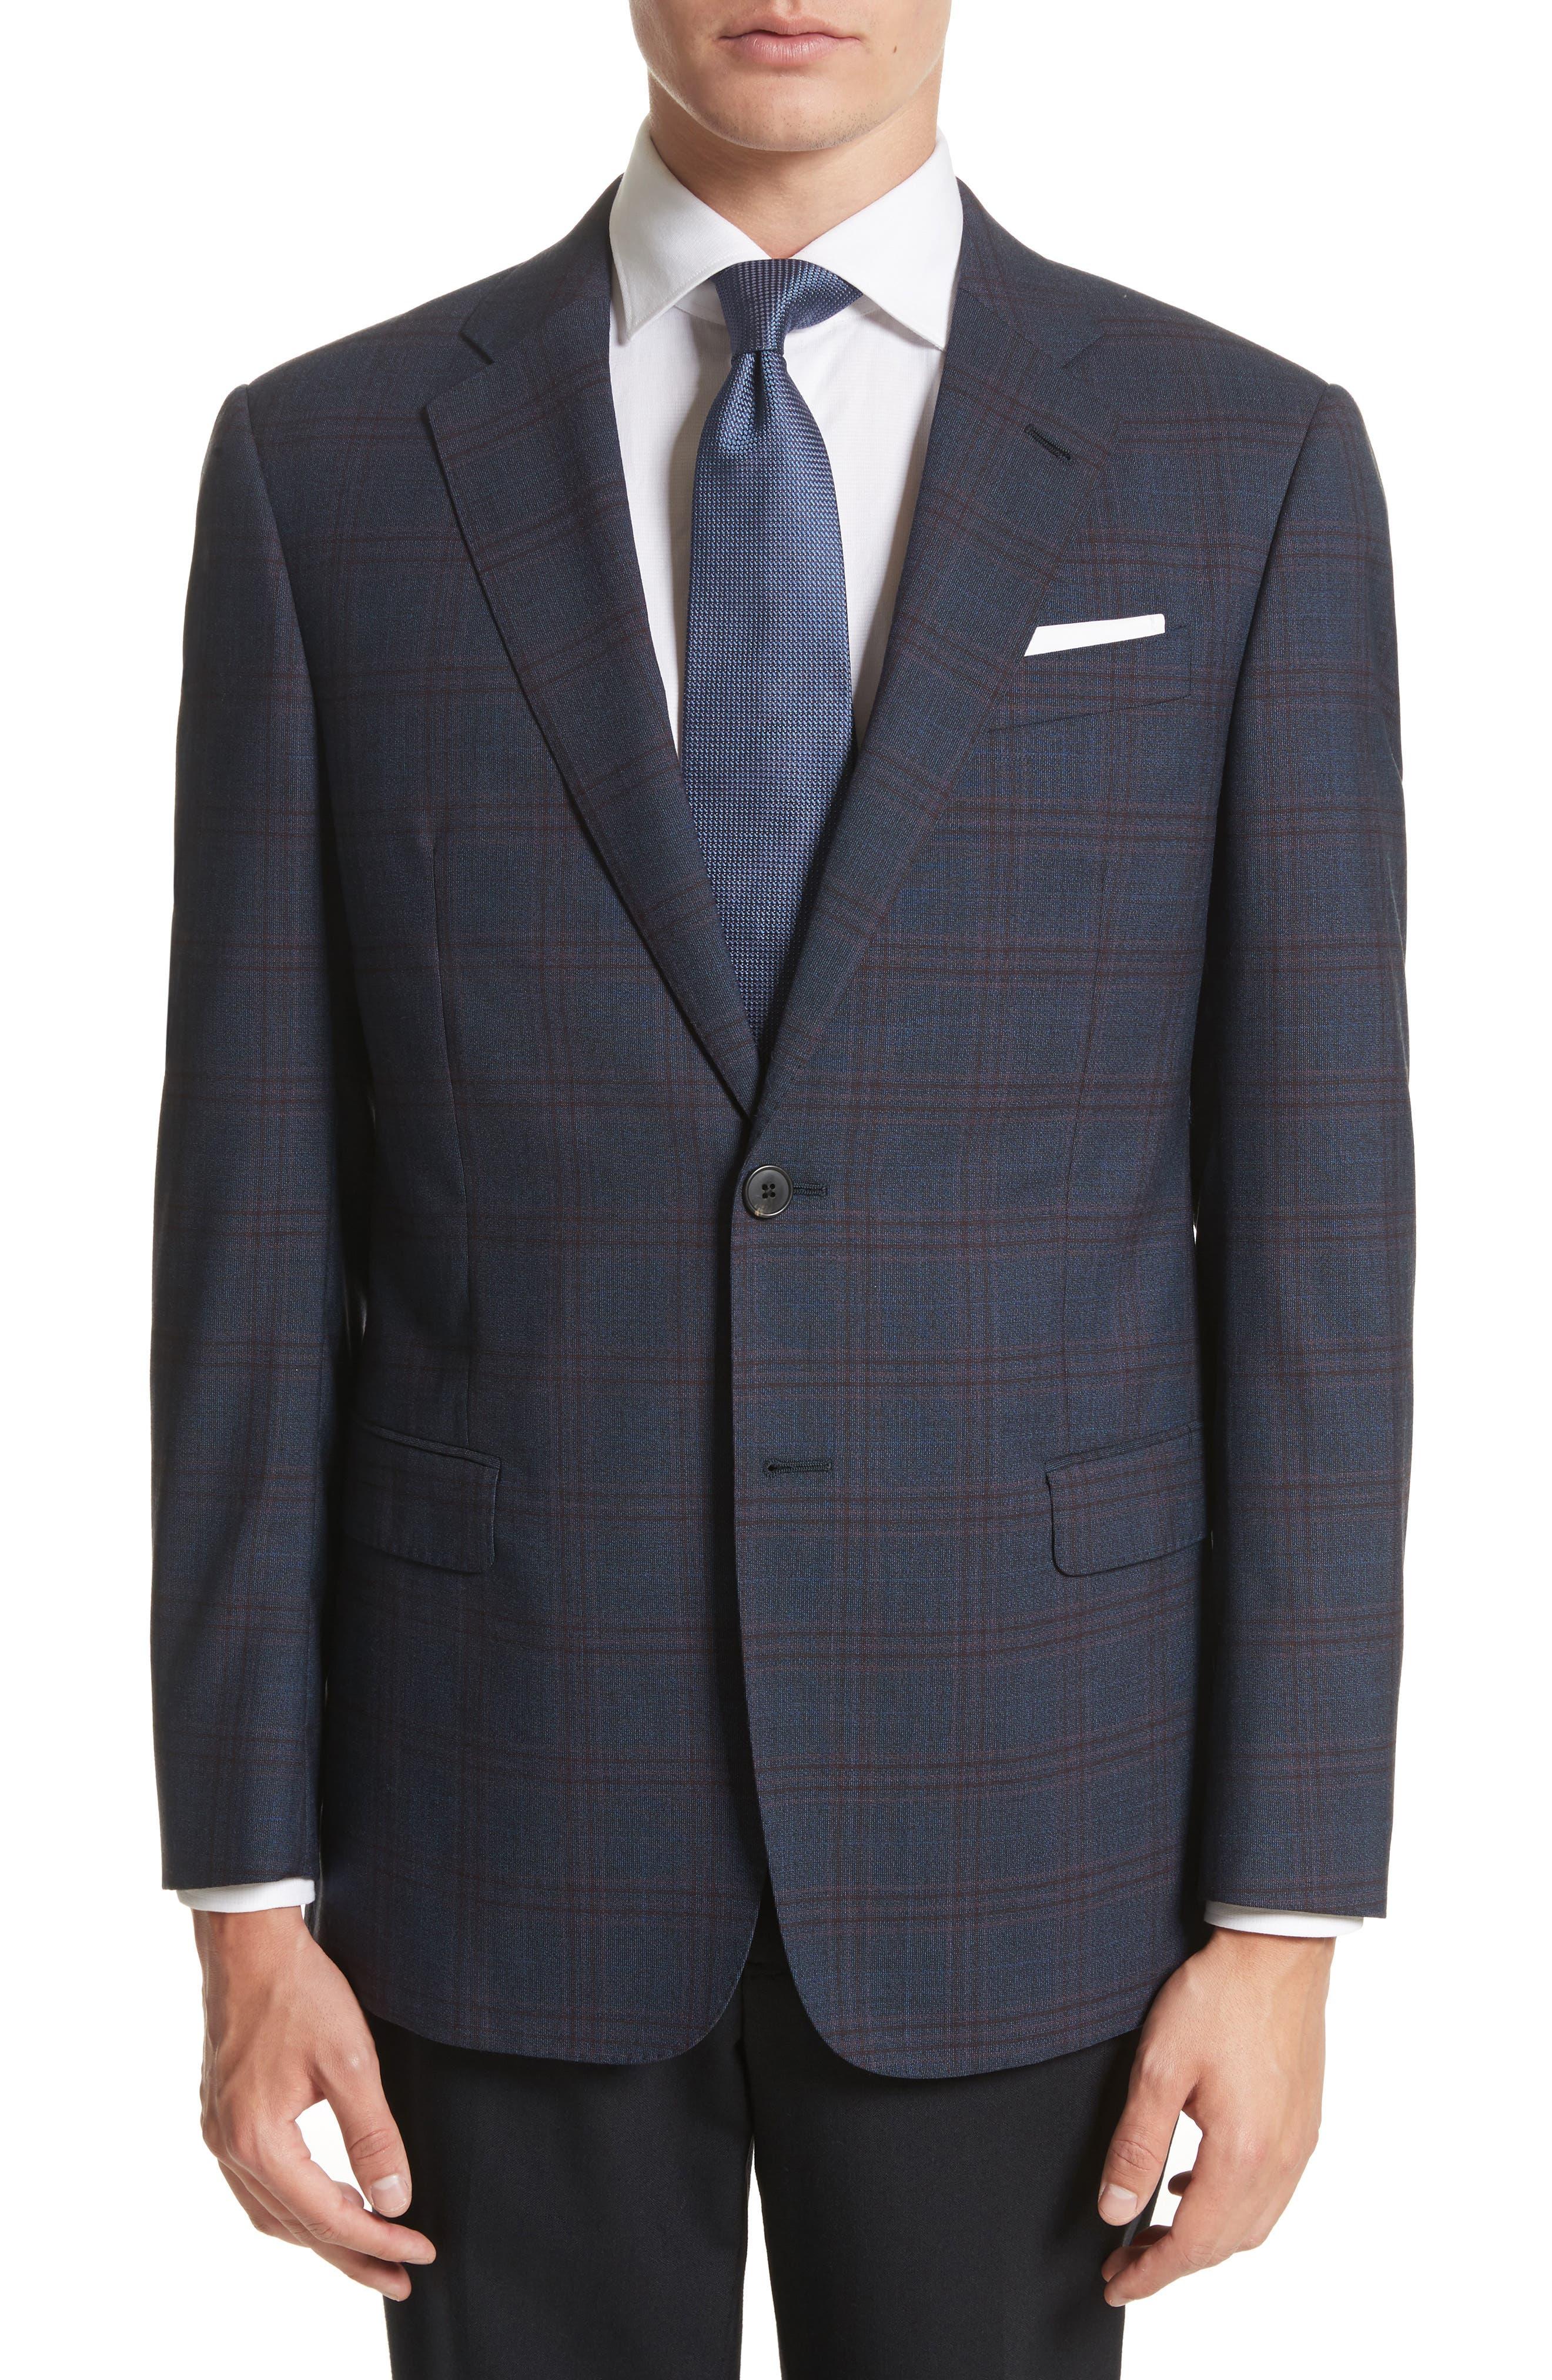 Alternate Image 1 Selected - Armani Collezioni G-Line Trim Fit Plaid Wool Sport Coat